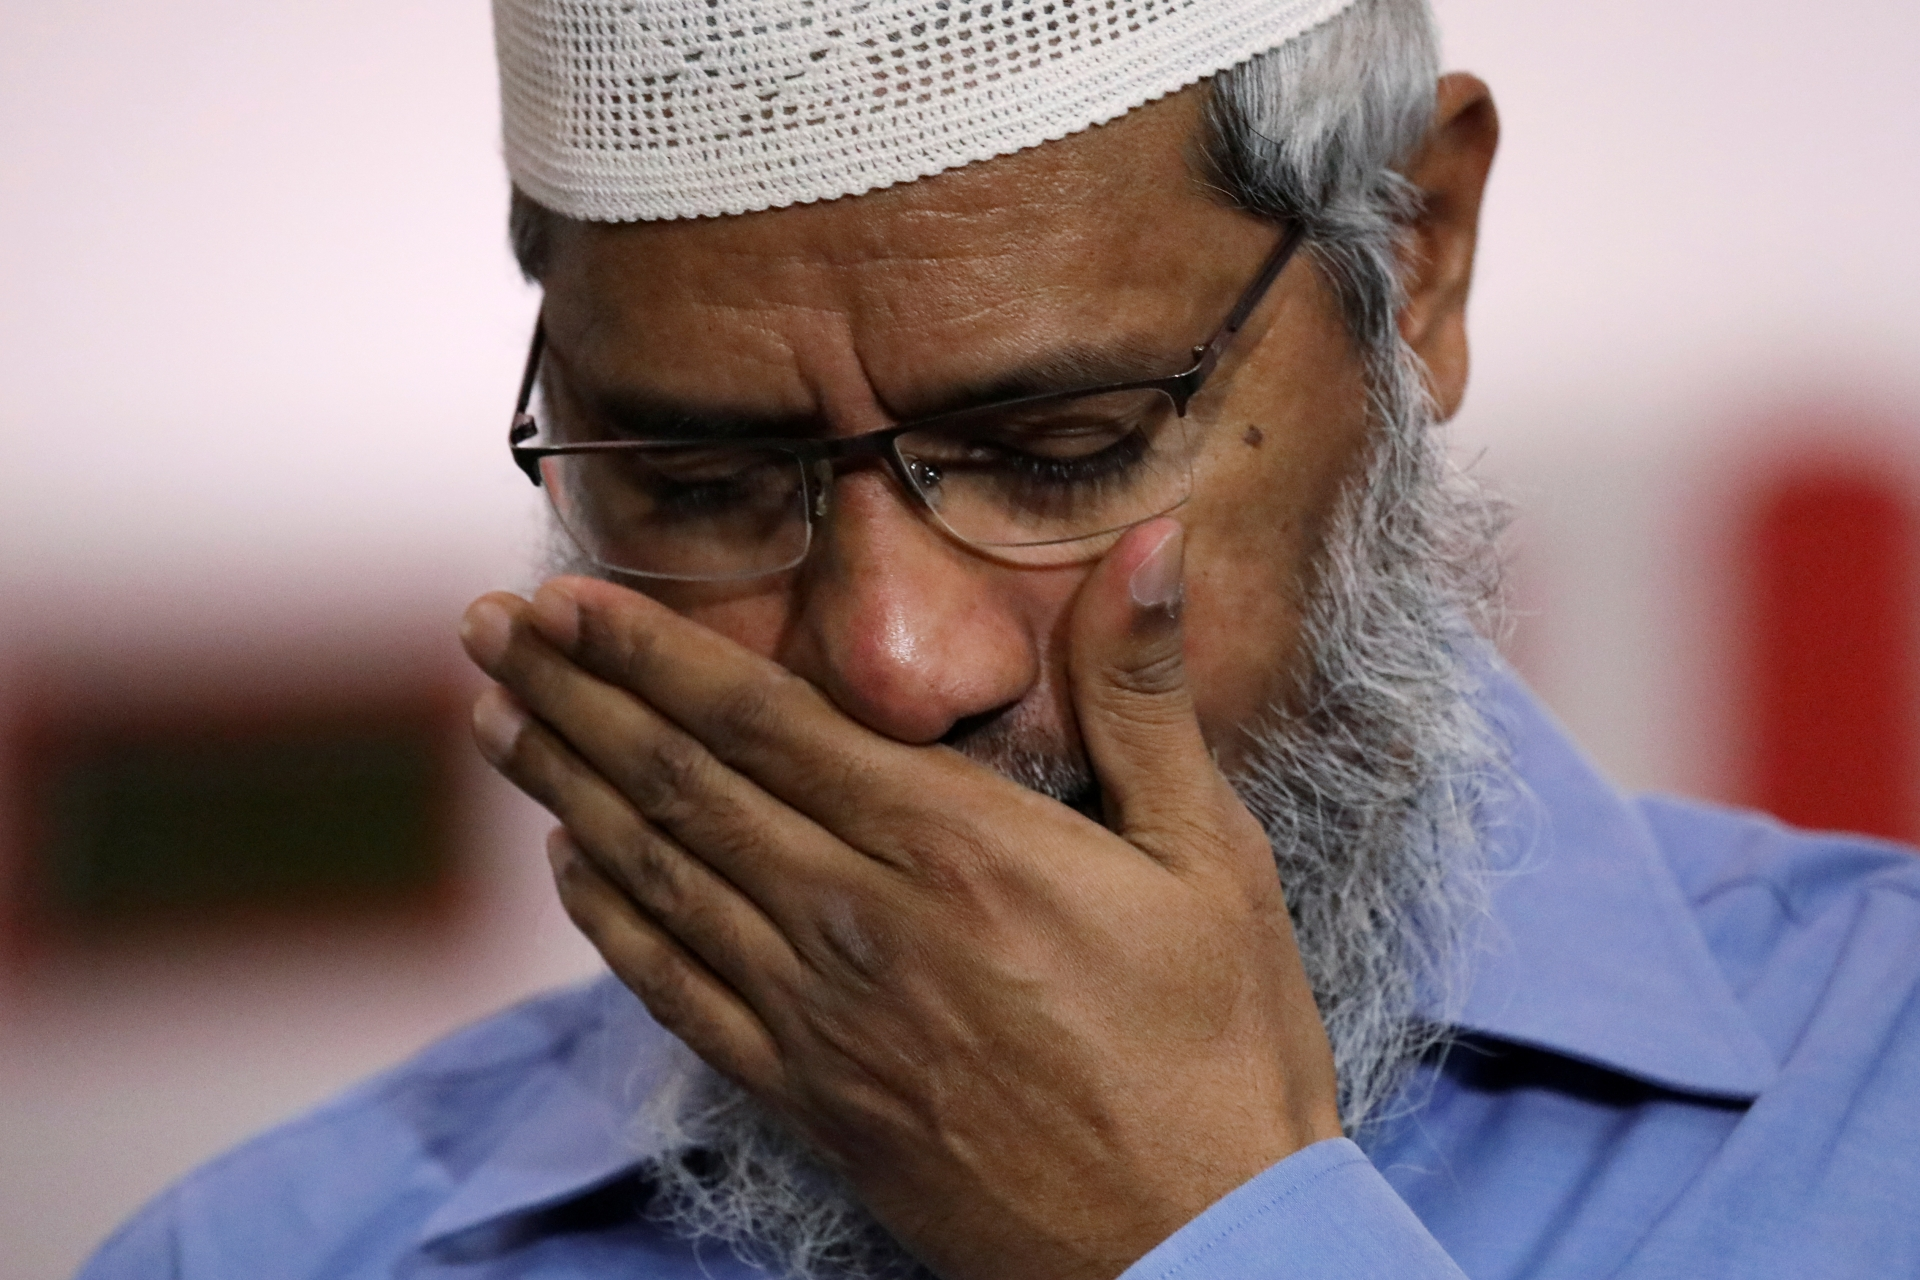 Malaysia won't send back Zakir Naik to India